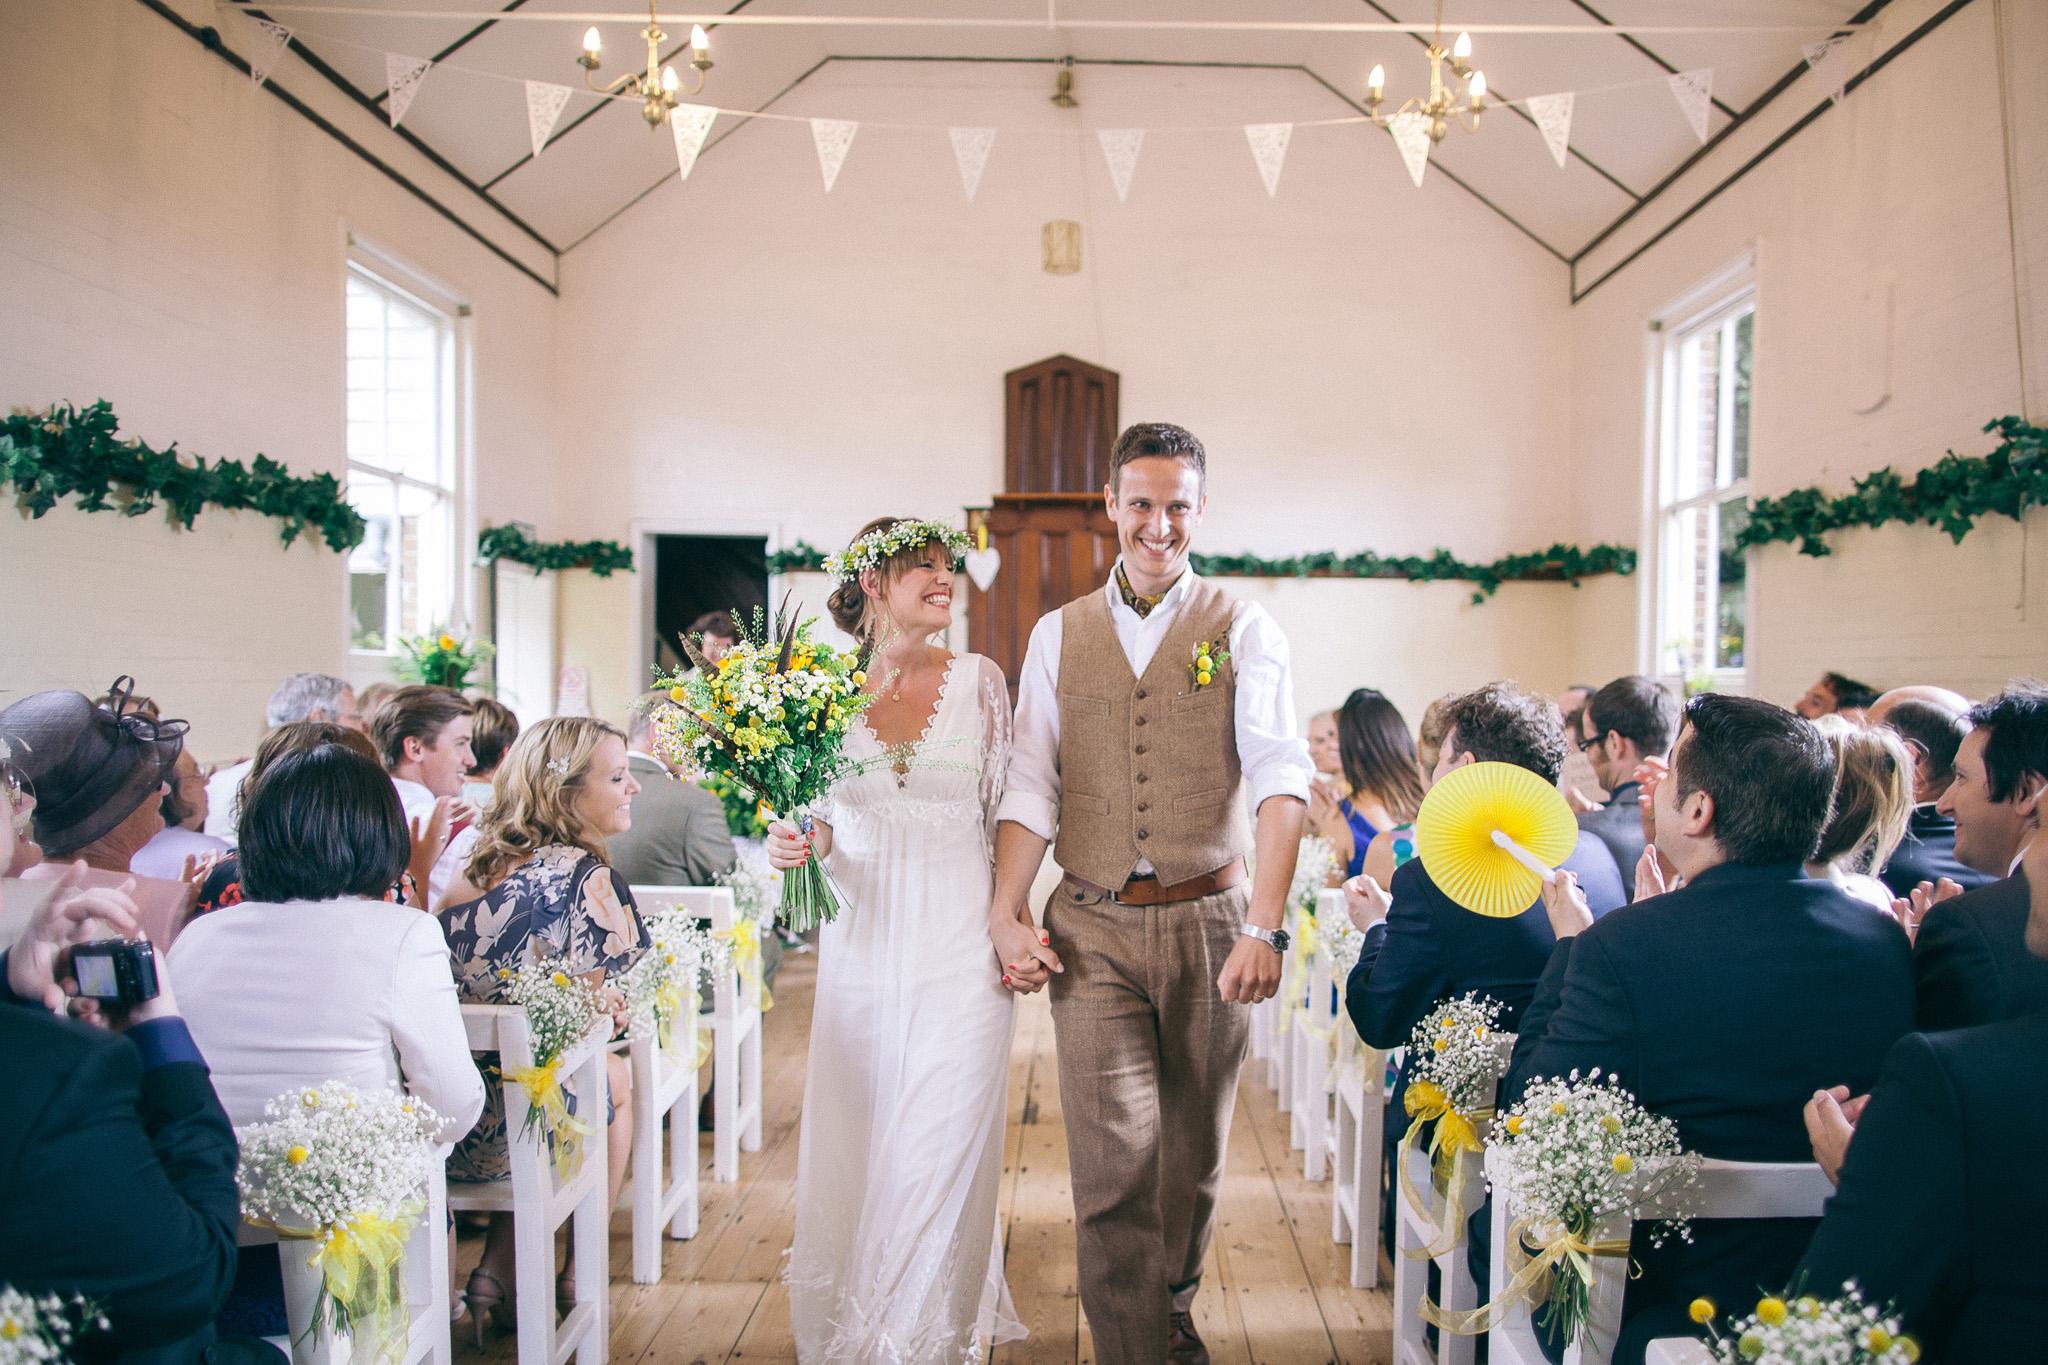 chantry_sussex_barn_wedding_317.jpg